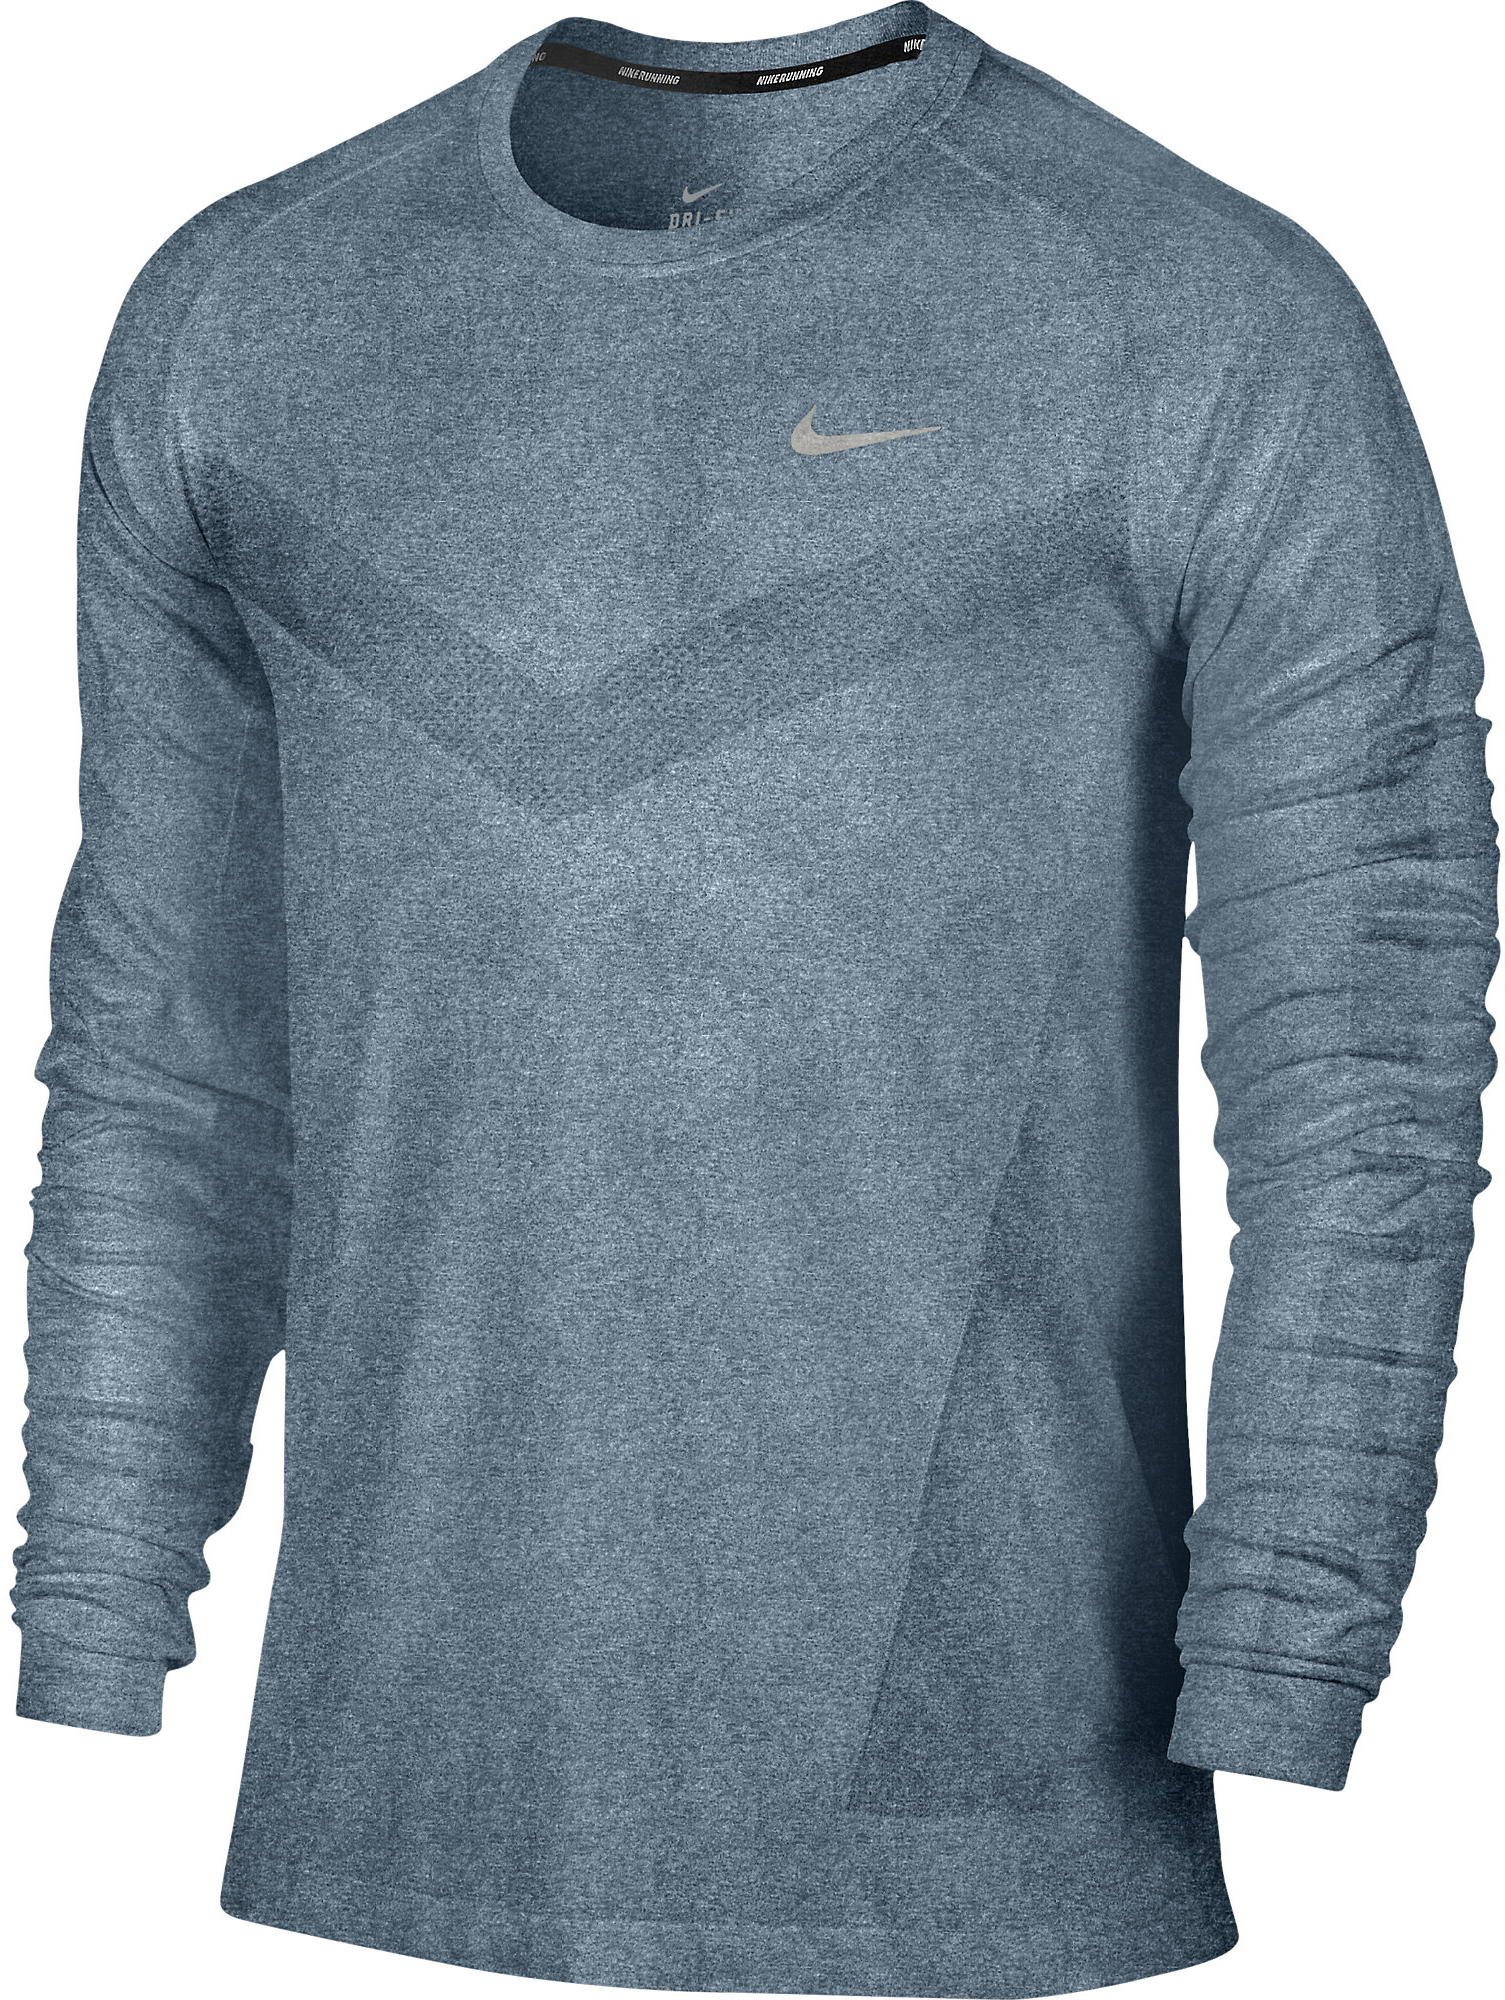 5039b50ddad758 Nike Dri Fit Knit Long Sleeve Tee - Men's | MEC